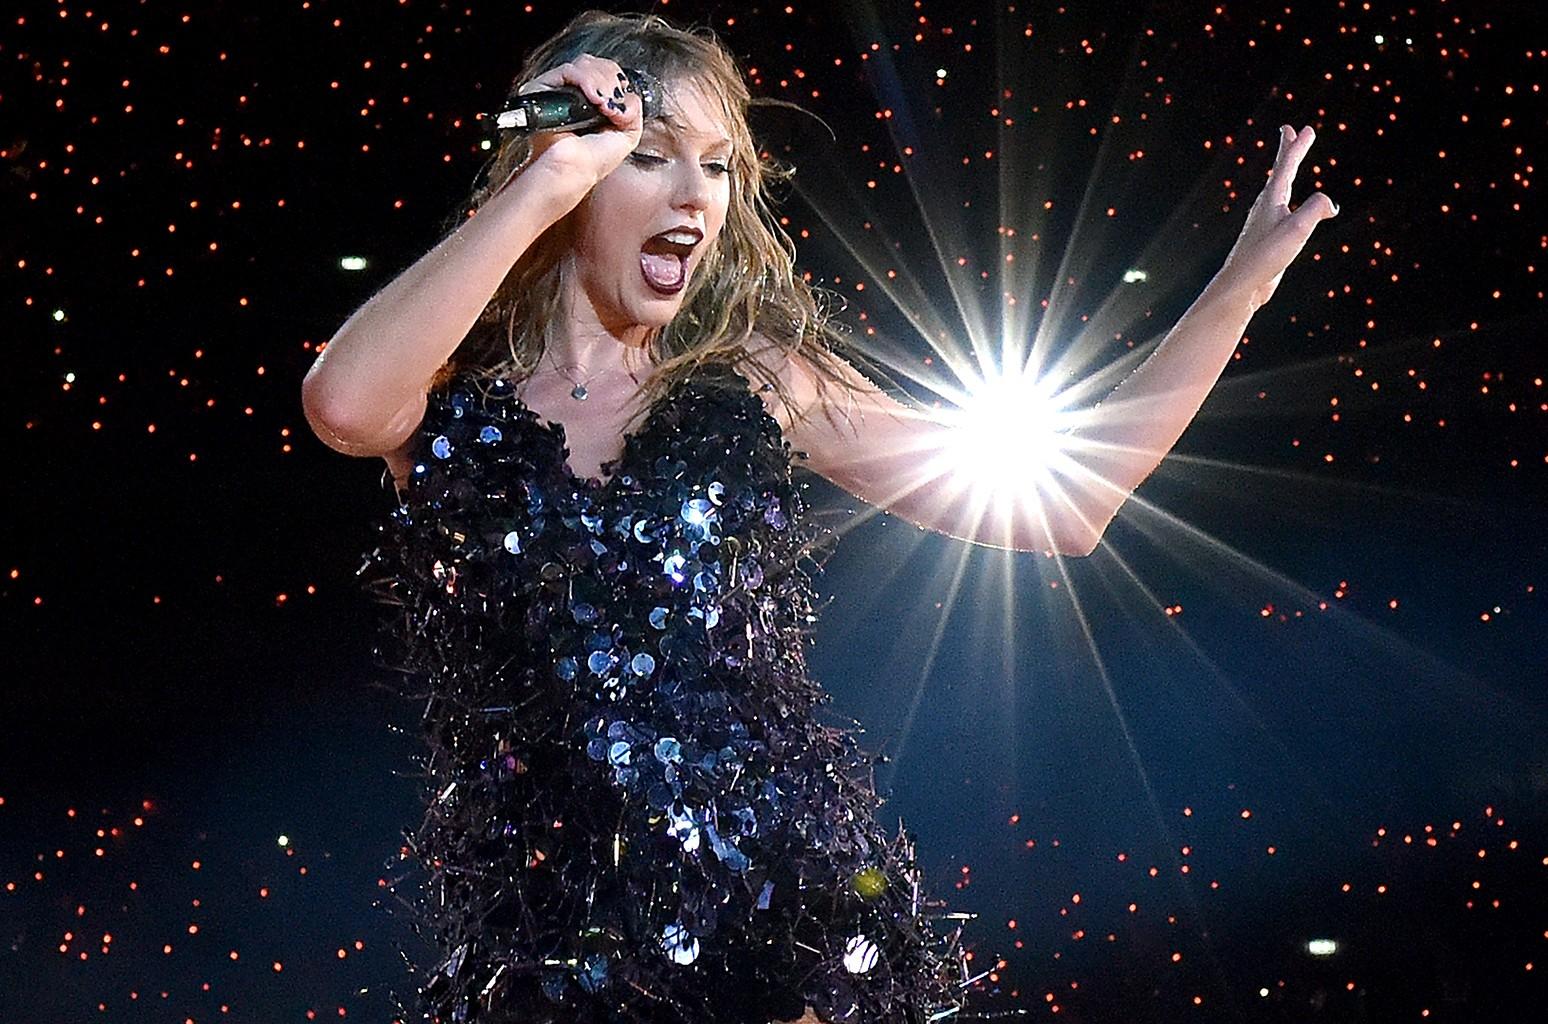 Тейлор Свифт устроила танец Джимми Батлера «22» в раздевалке «13/10»